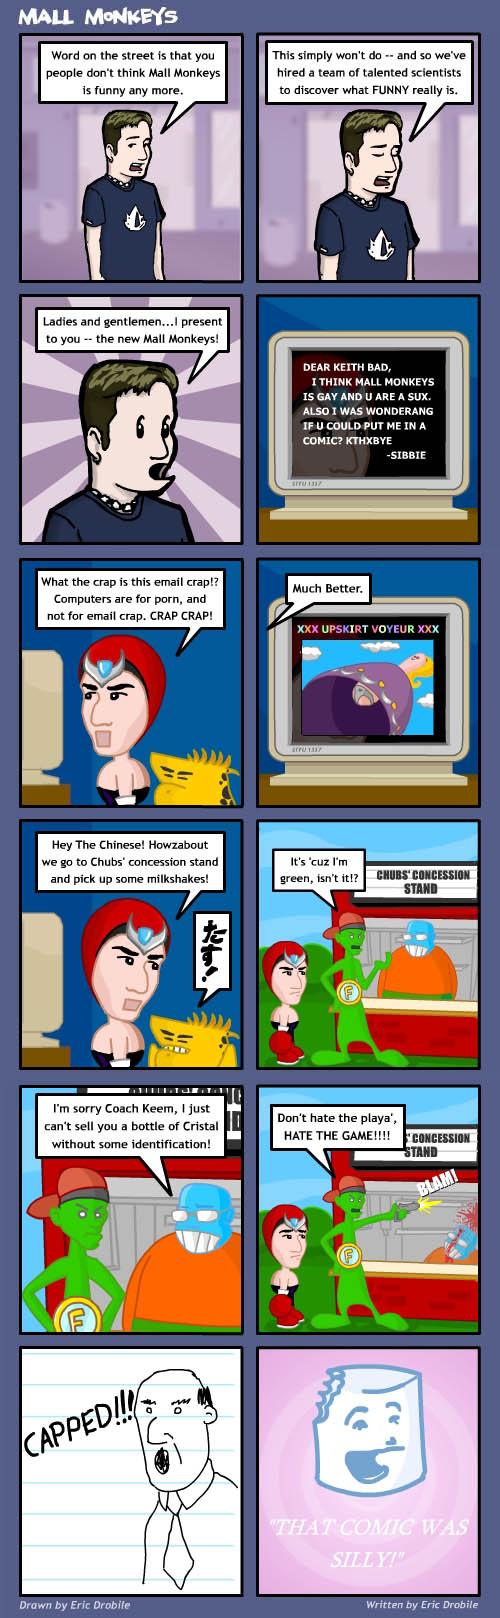 Mall Monkeys Comic - Homestar Monkeys